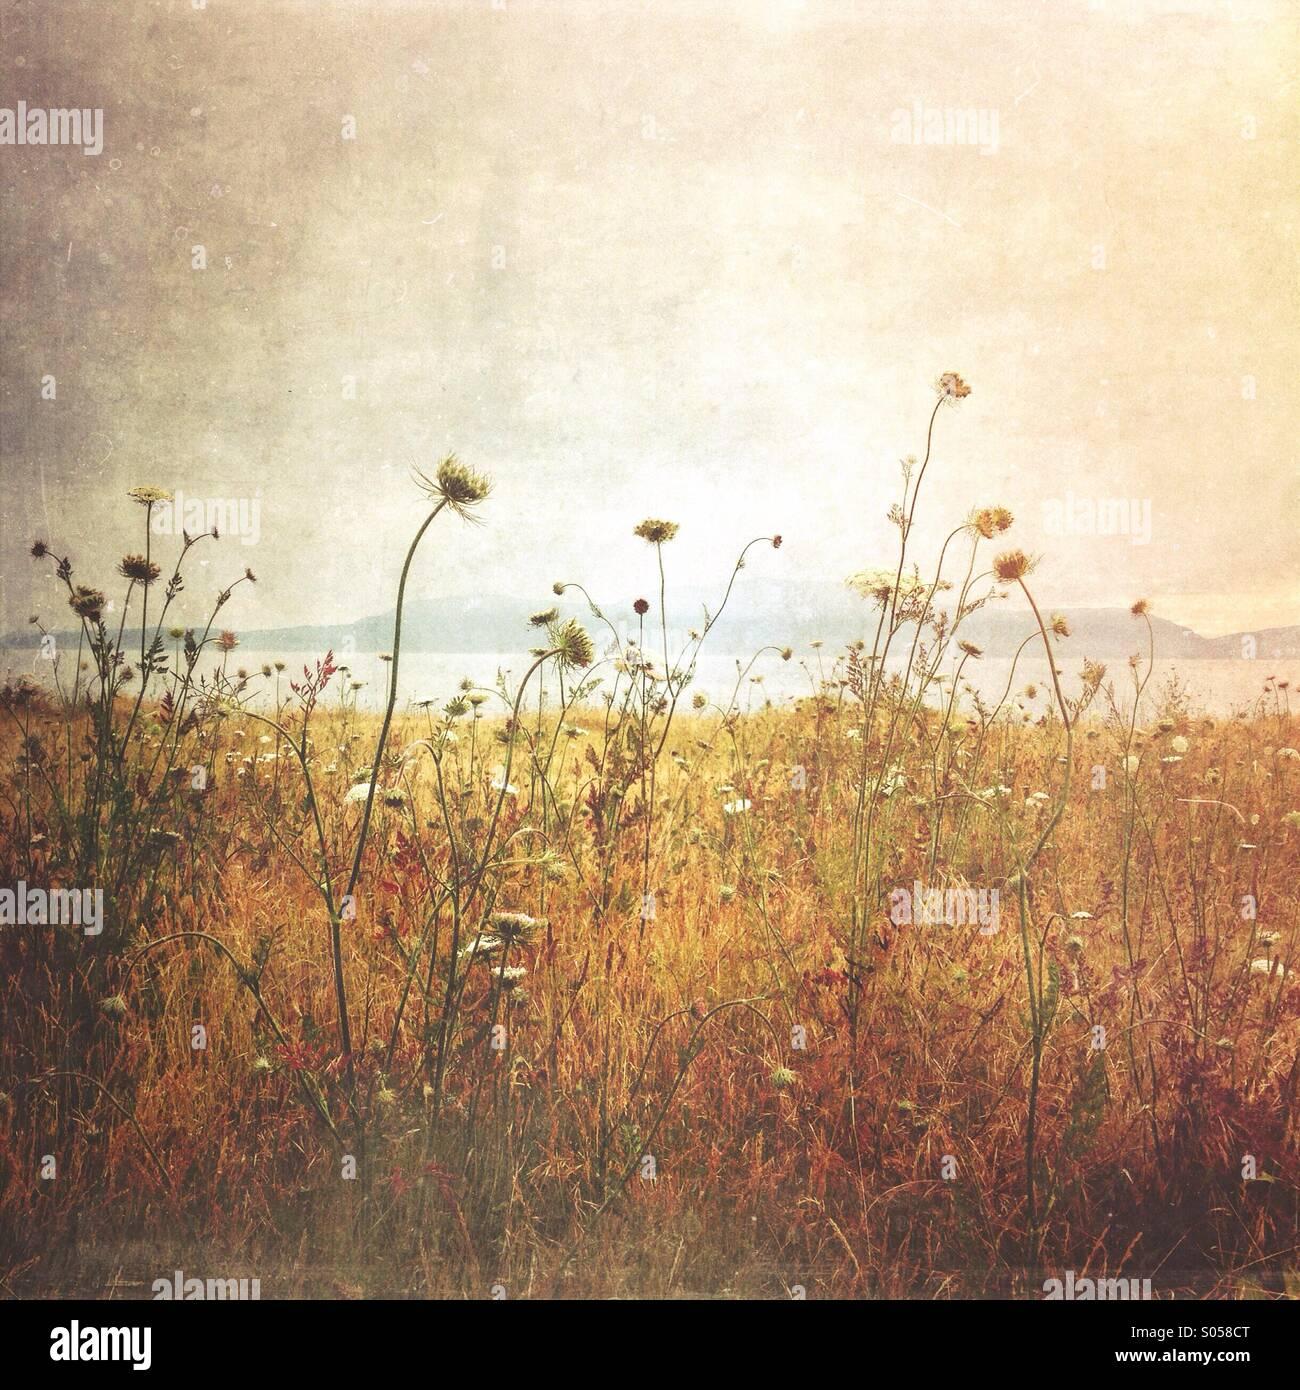 Pacific Northwest Wildflowers - Stock Image